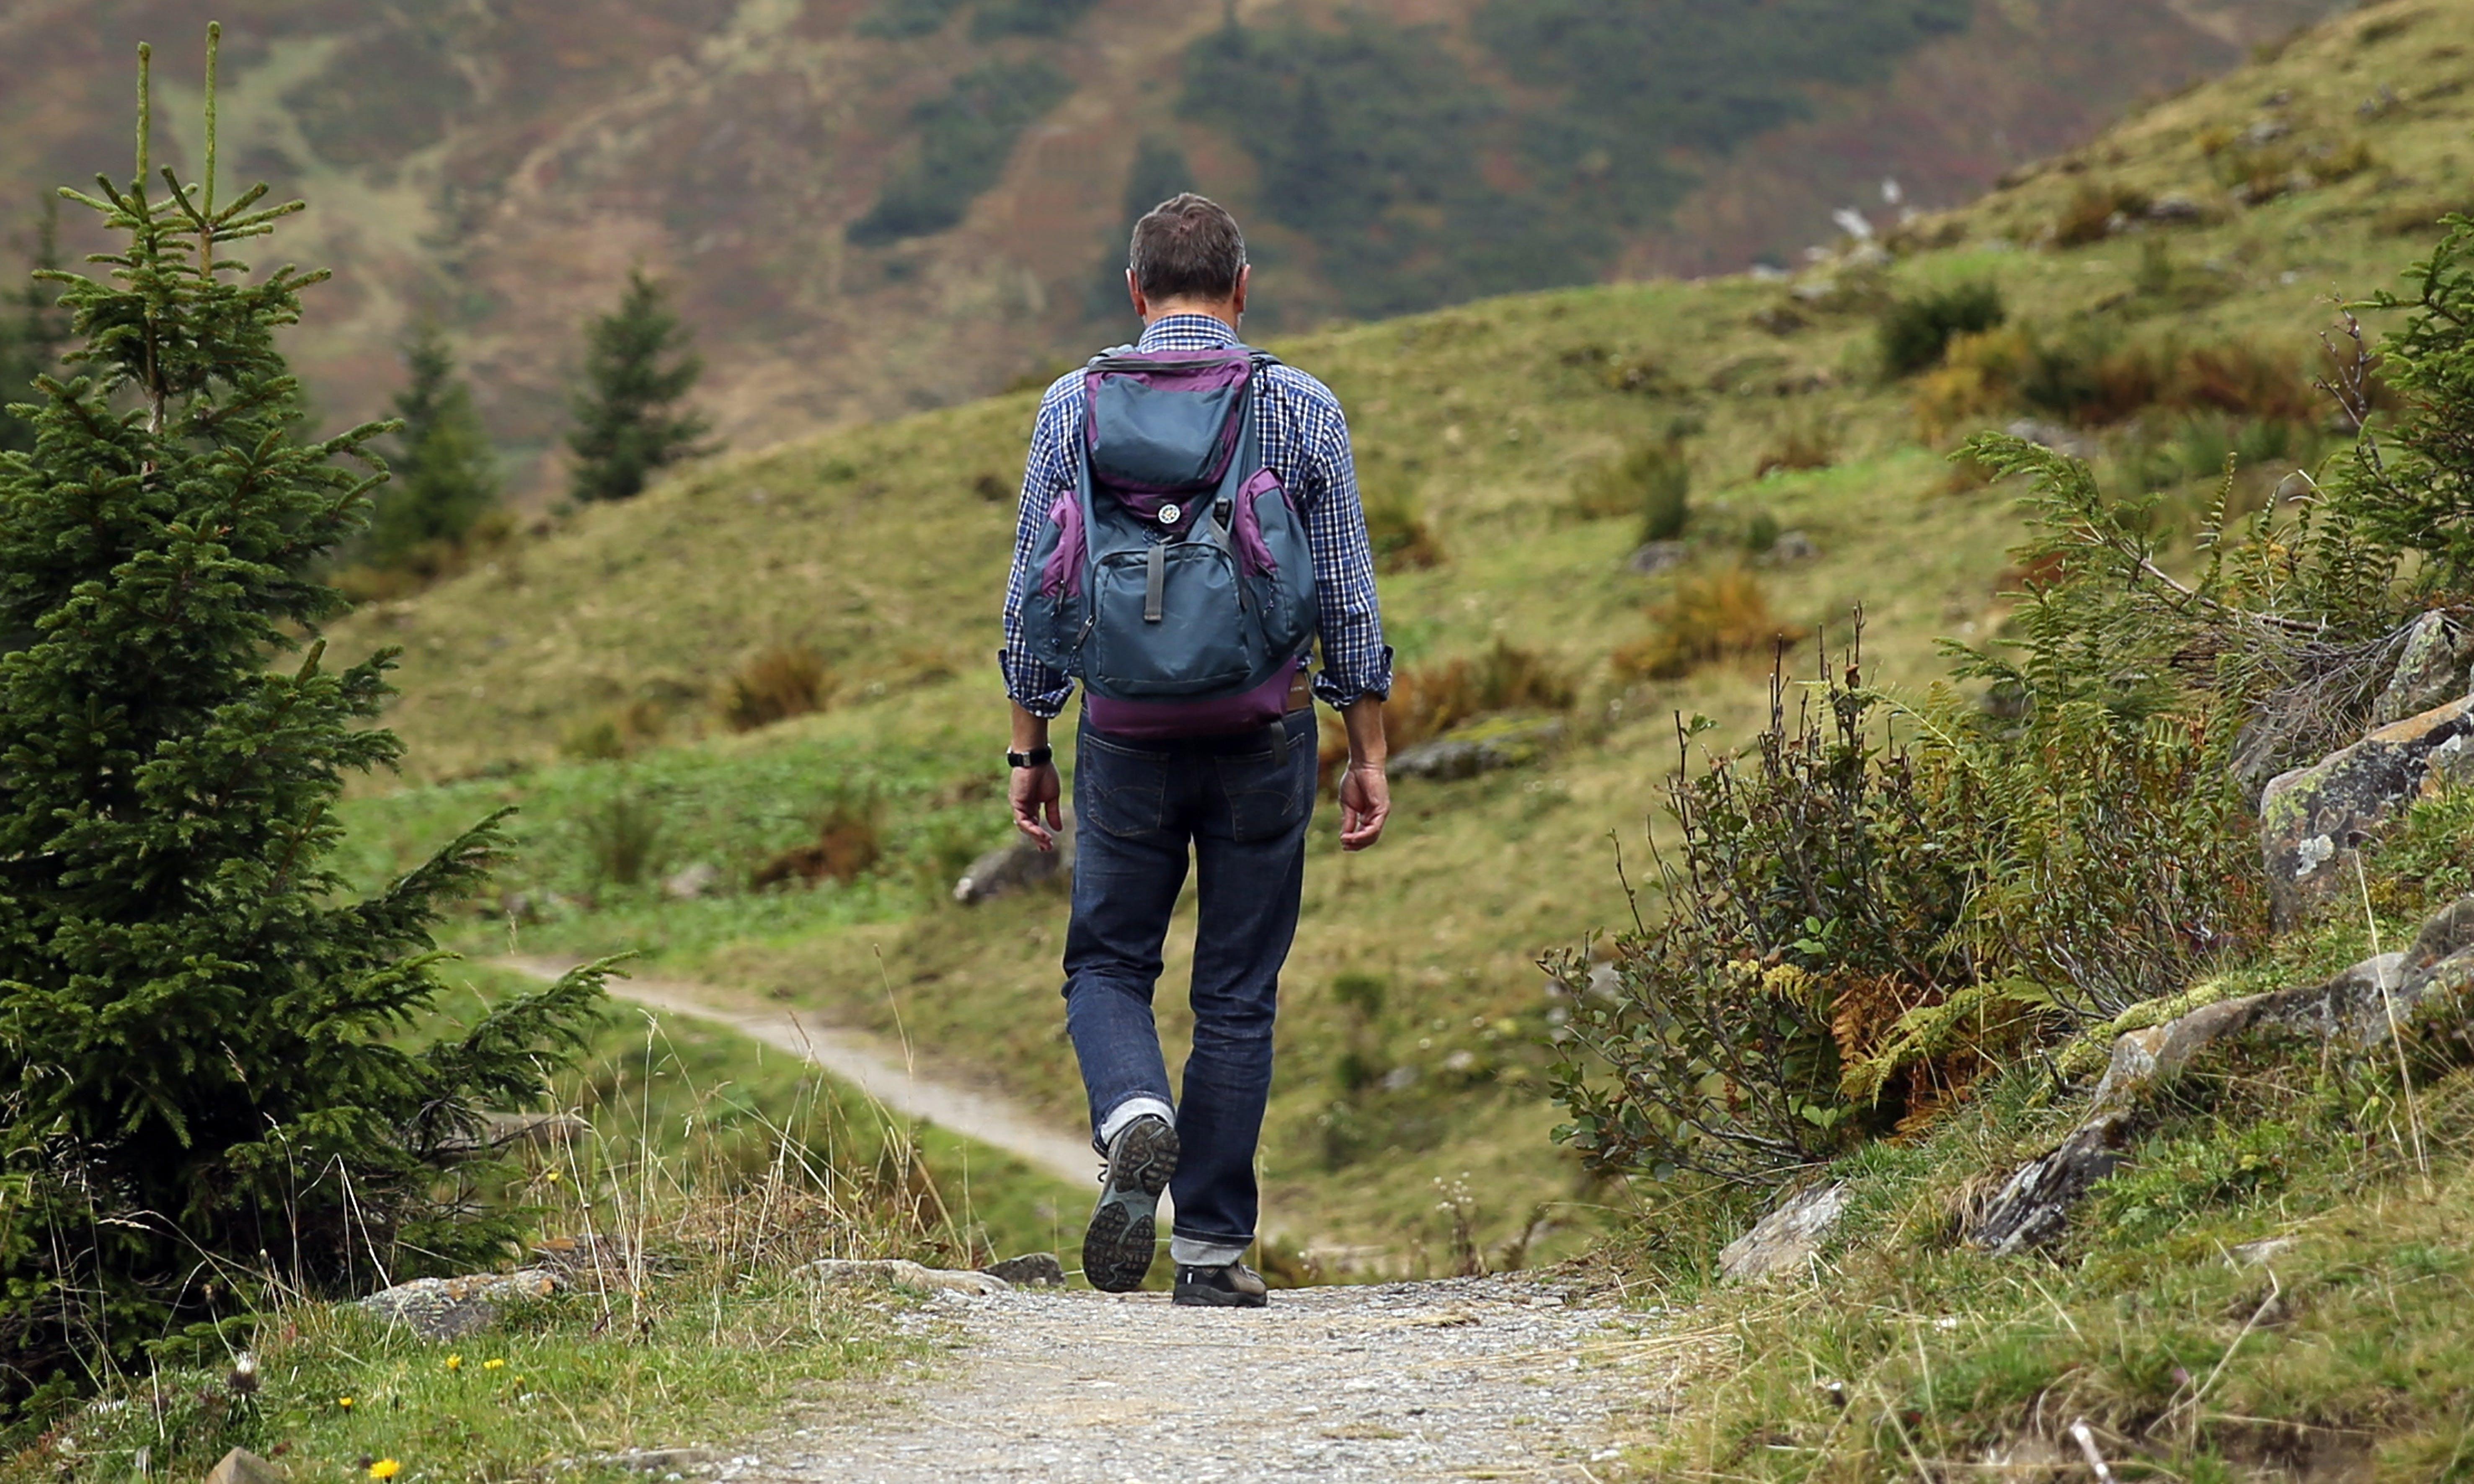 Kostenloses Stock Foto zu abenteuer, berg, bergwandern, bergweg